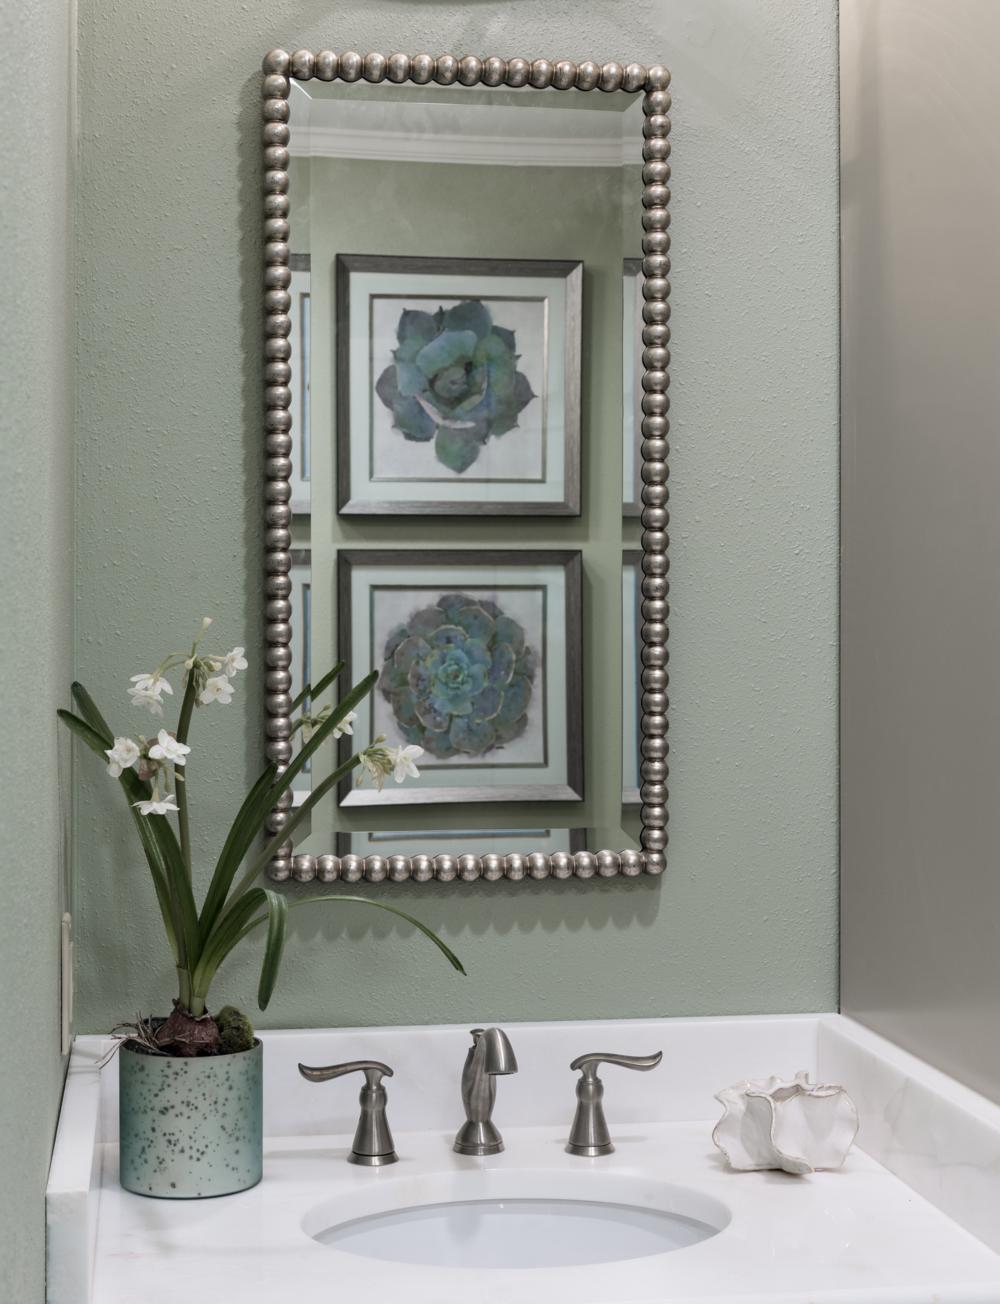 bathroom mirror wall art new orleans best interior design khb interiors